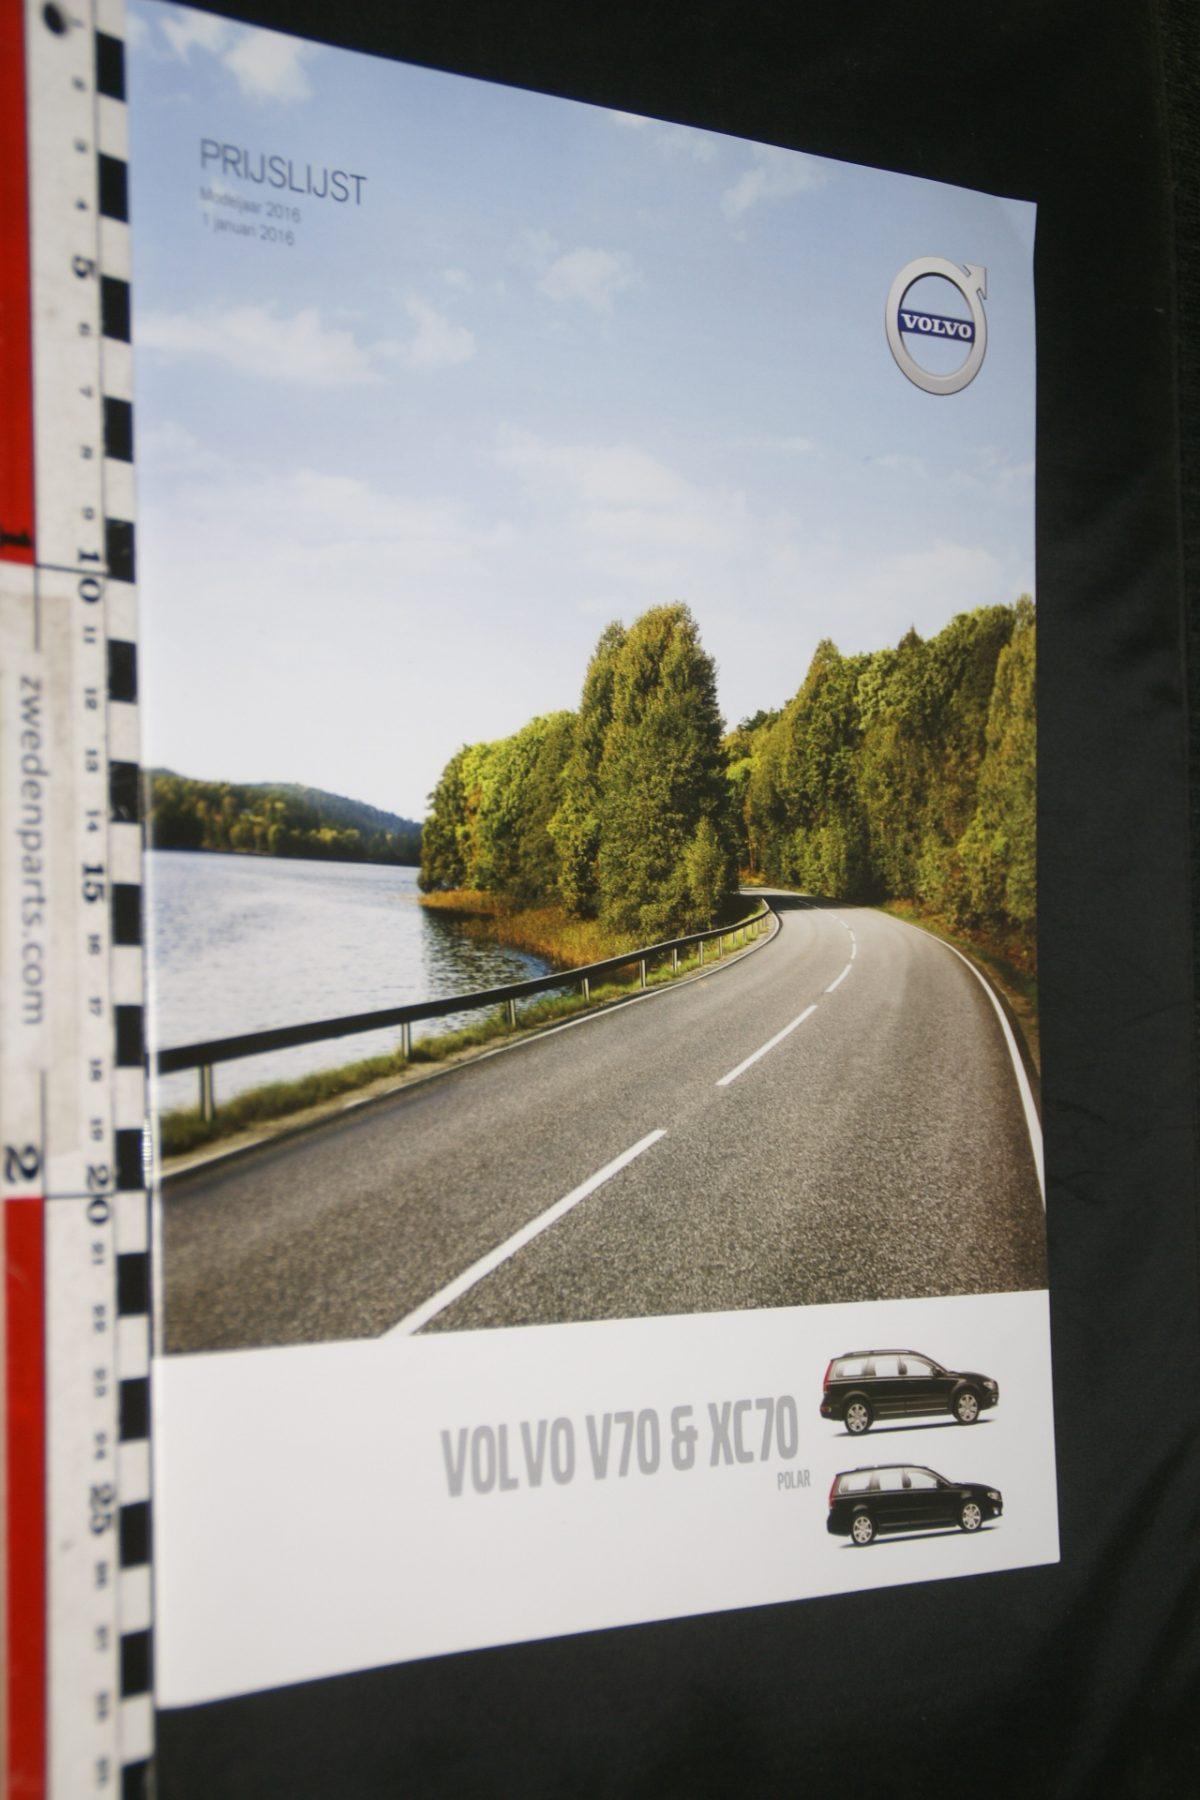 DSC06336 2016 brochure Volvo V70 en XC70 Polar (+) nr MY16 01-2016-V5